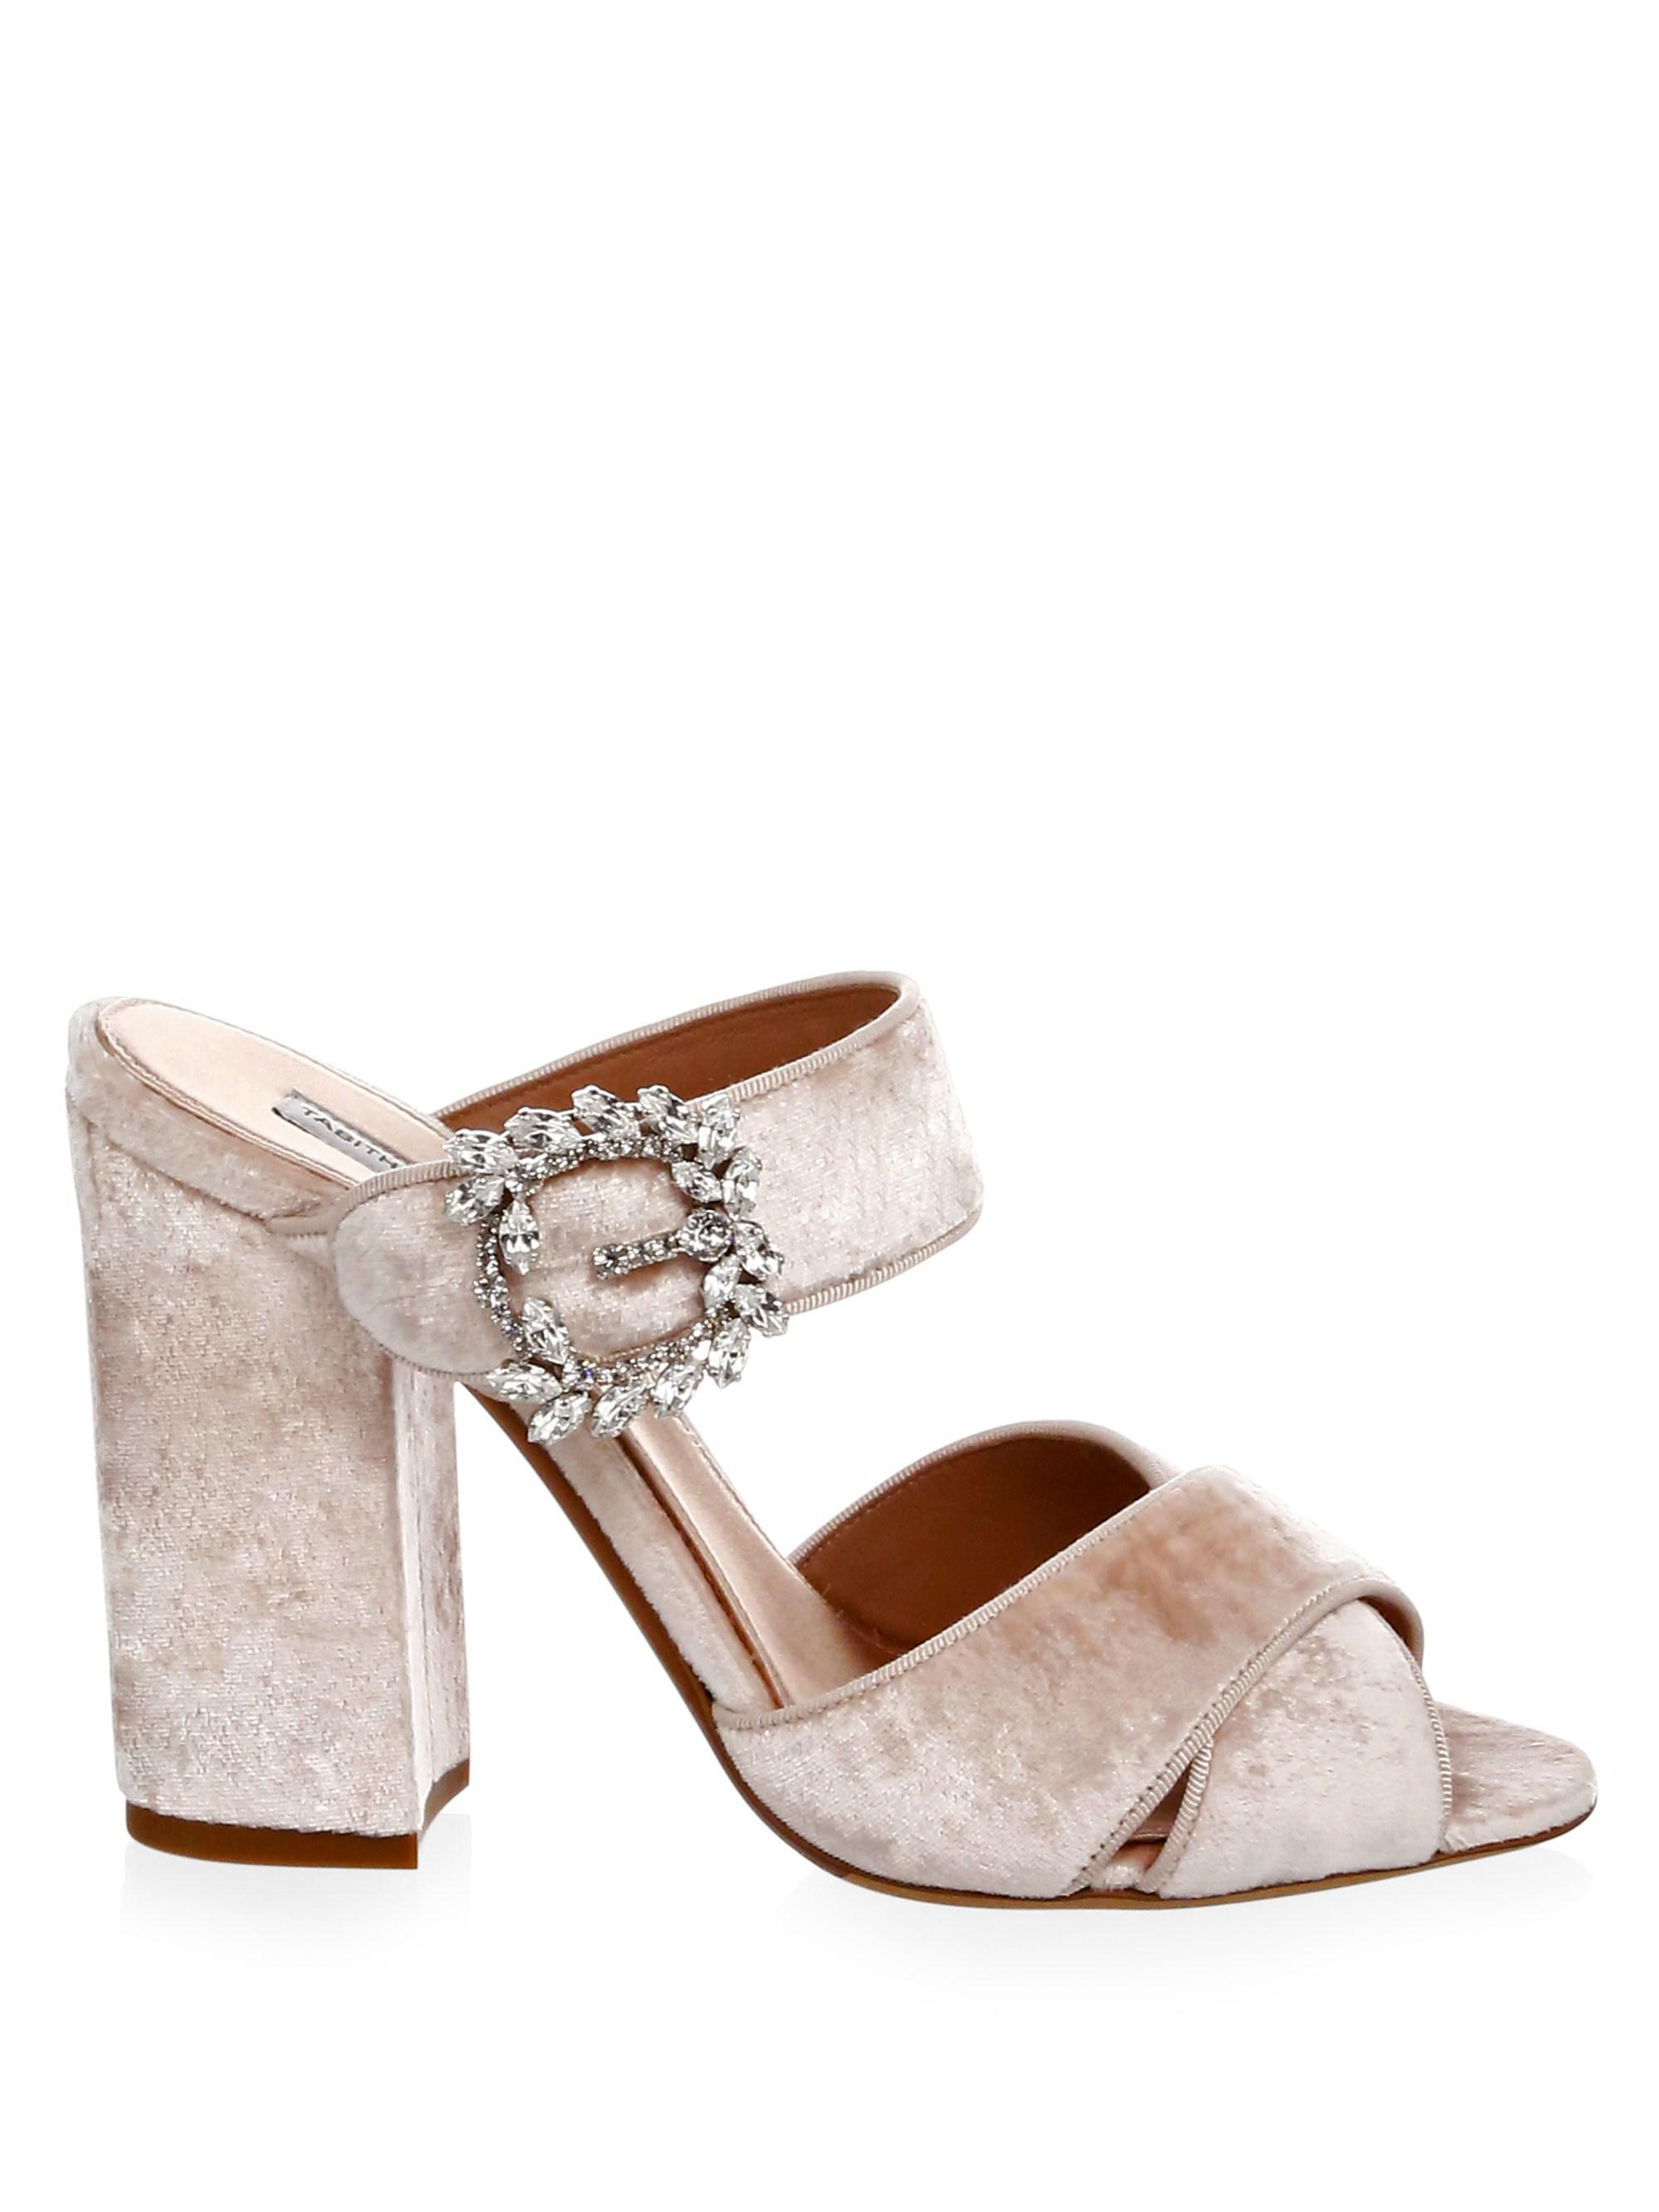 Tabitha Simmons Reyner Buckle Slide Sandals yCxbhsIB